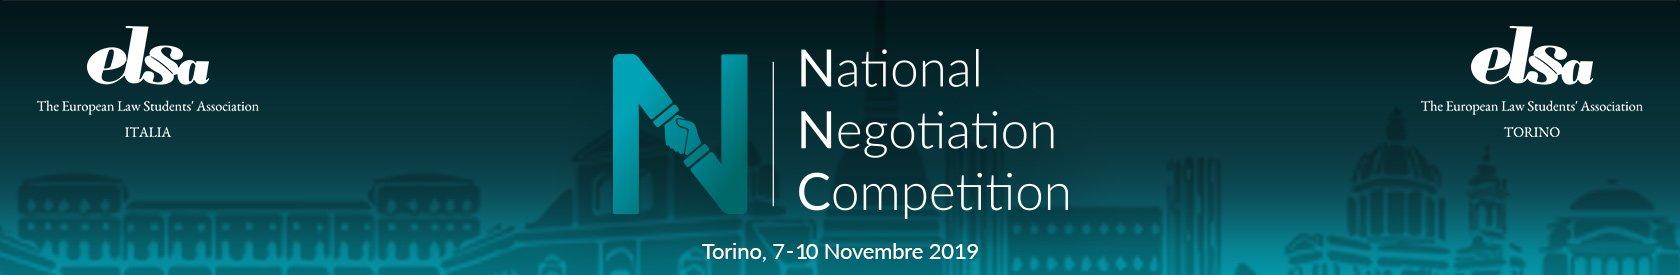 V National Negotiation Competition